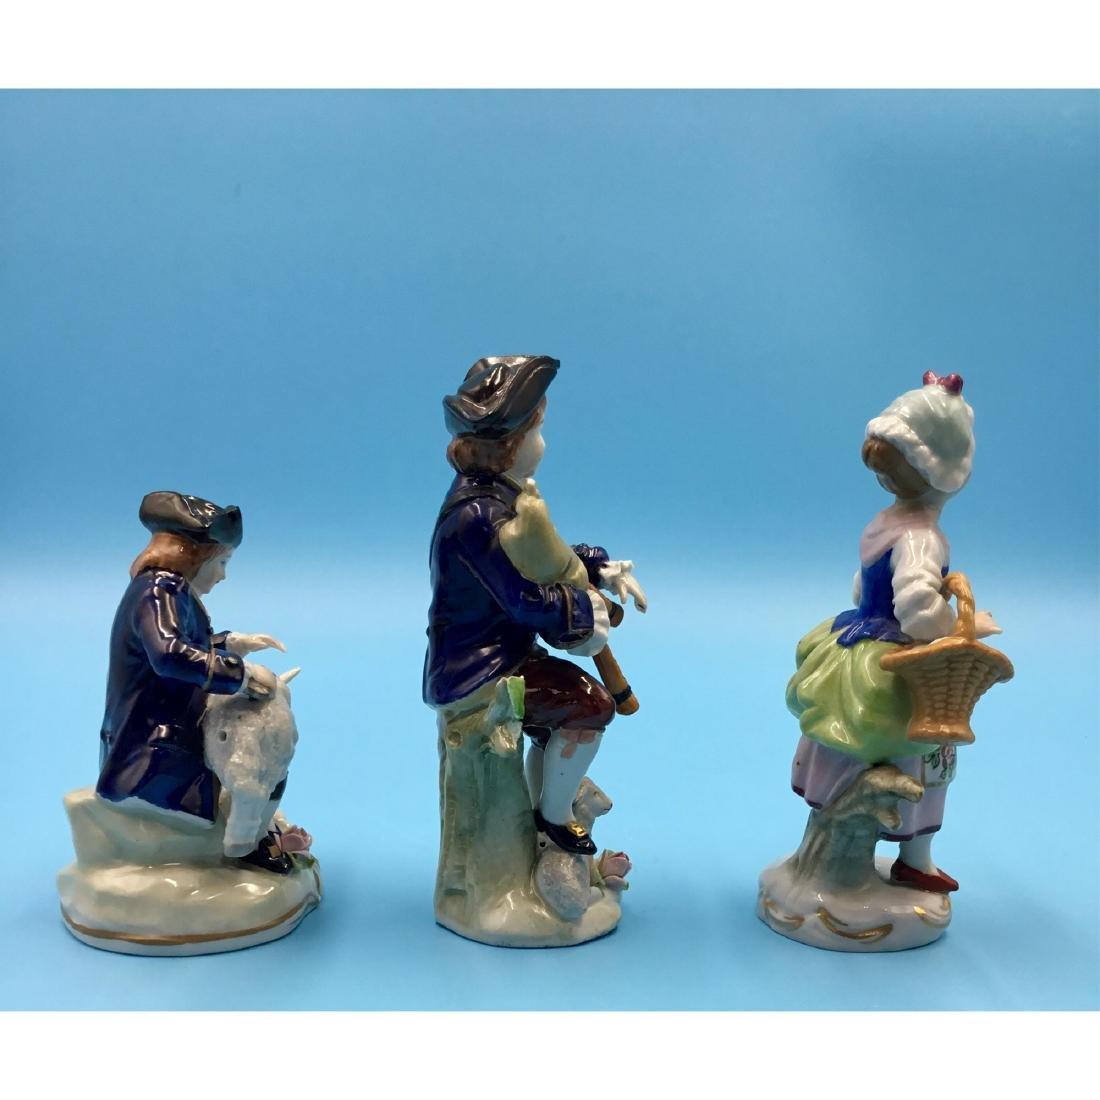 GROUP OF 3 SITZENDORF GERMAN PORCELAIN FIGURINES - 4